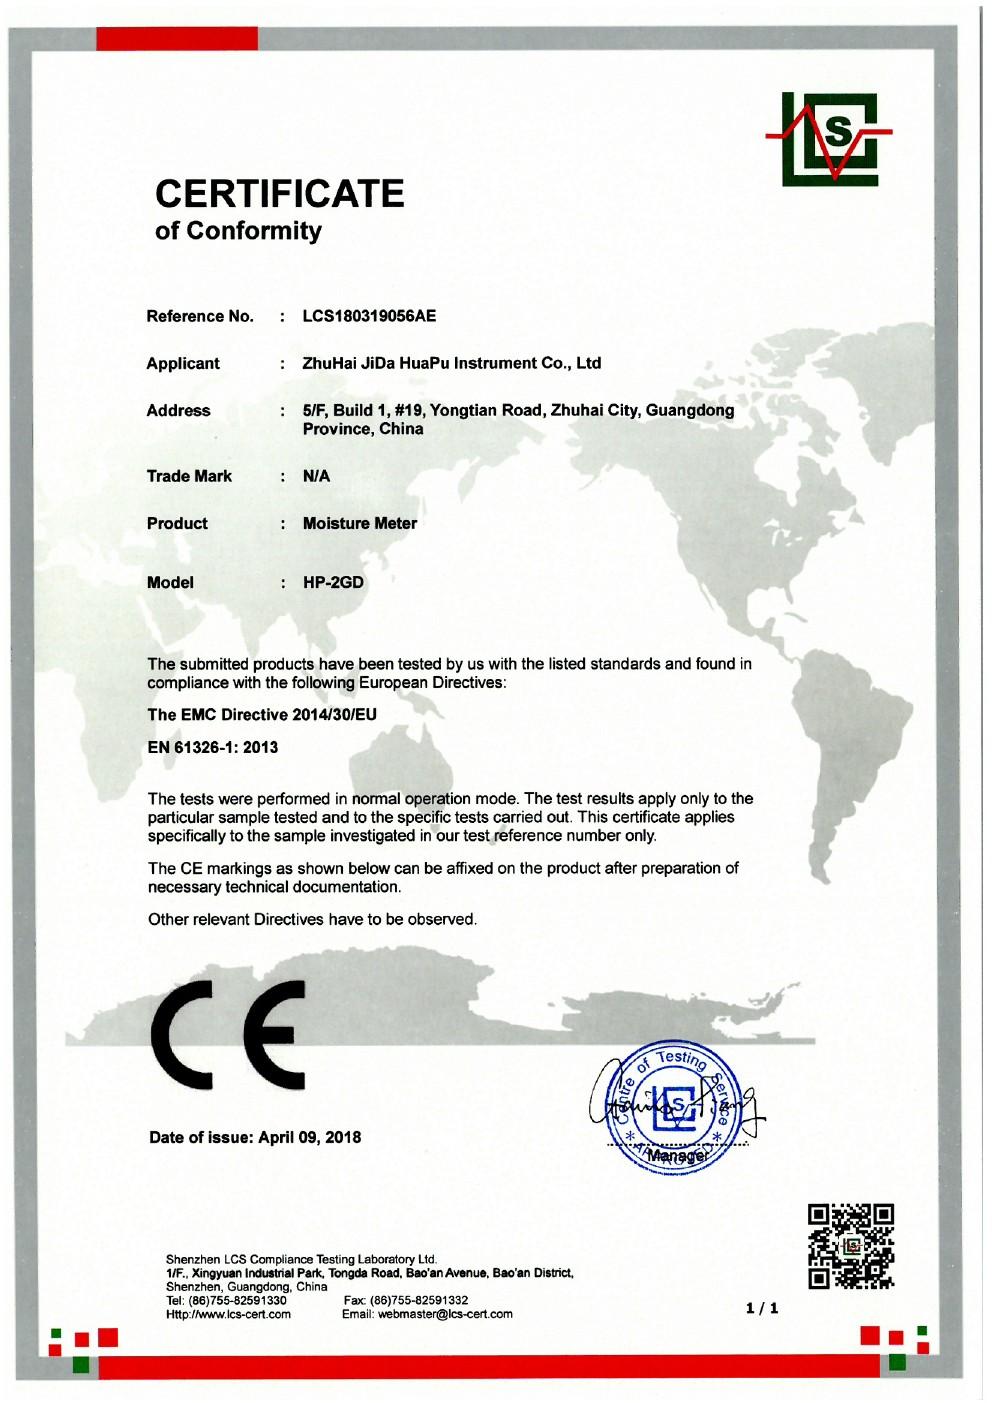 HoldPeak easy to use moisture meter for plants export for testing-6